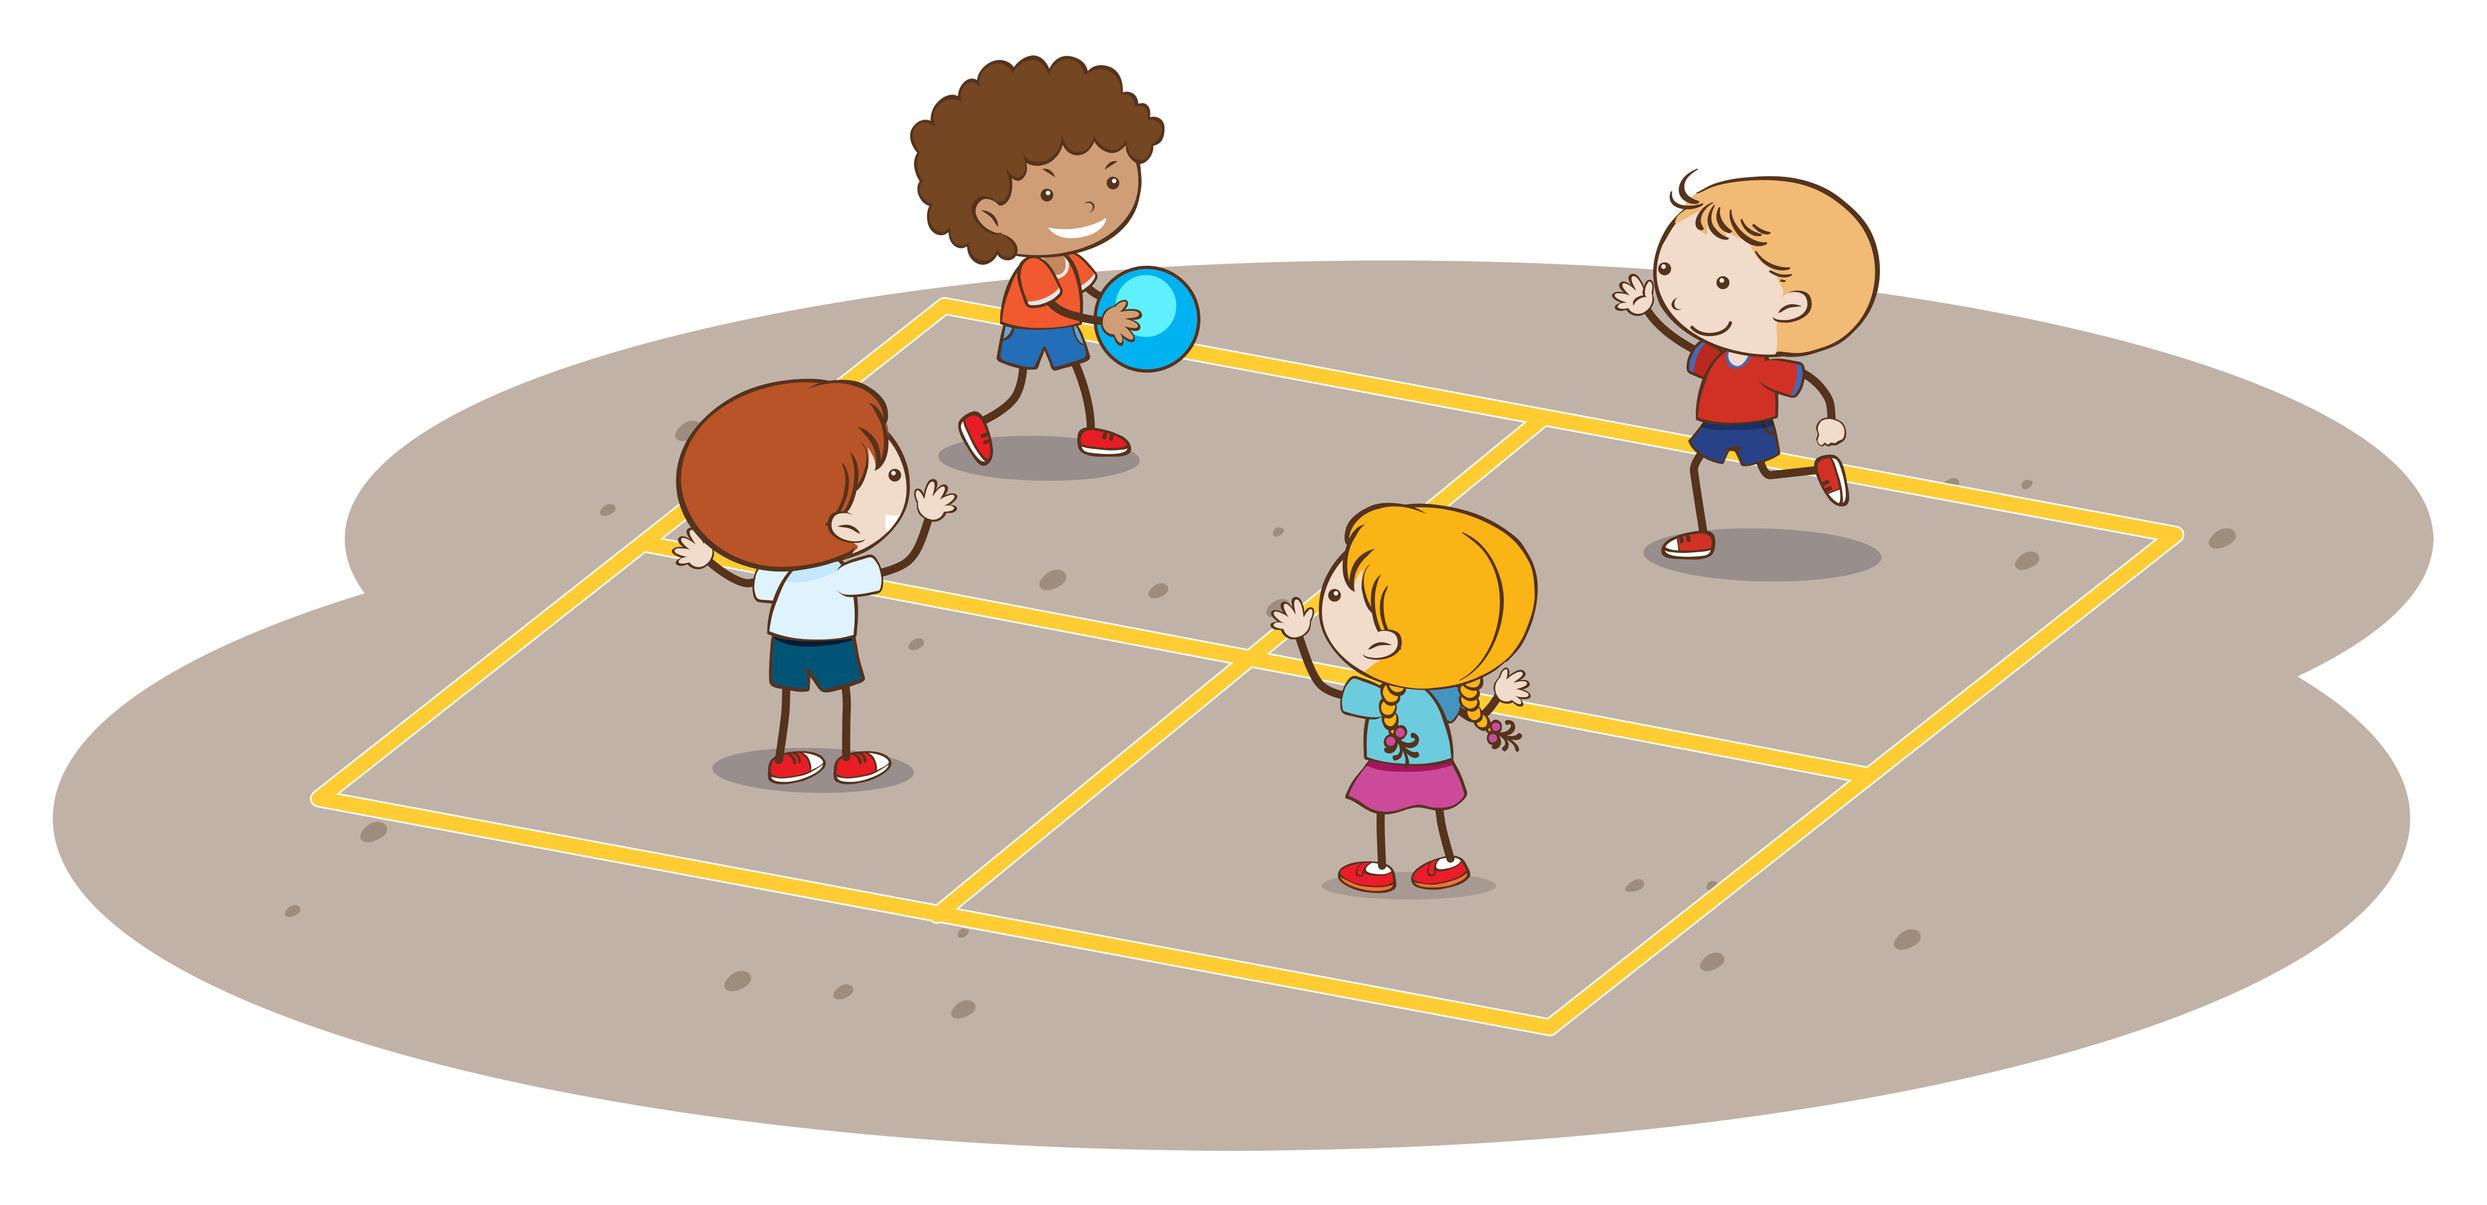 Some cartoon children playing handball